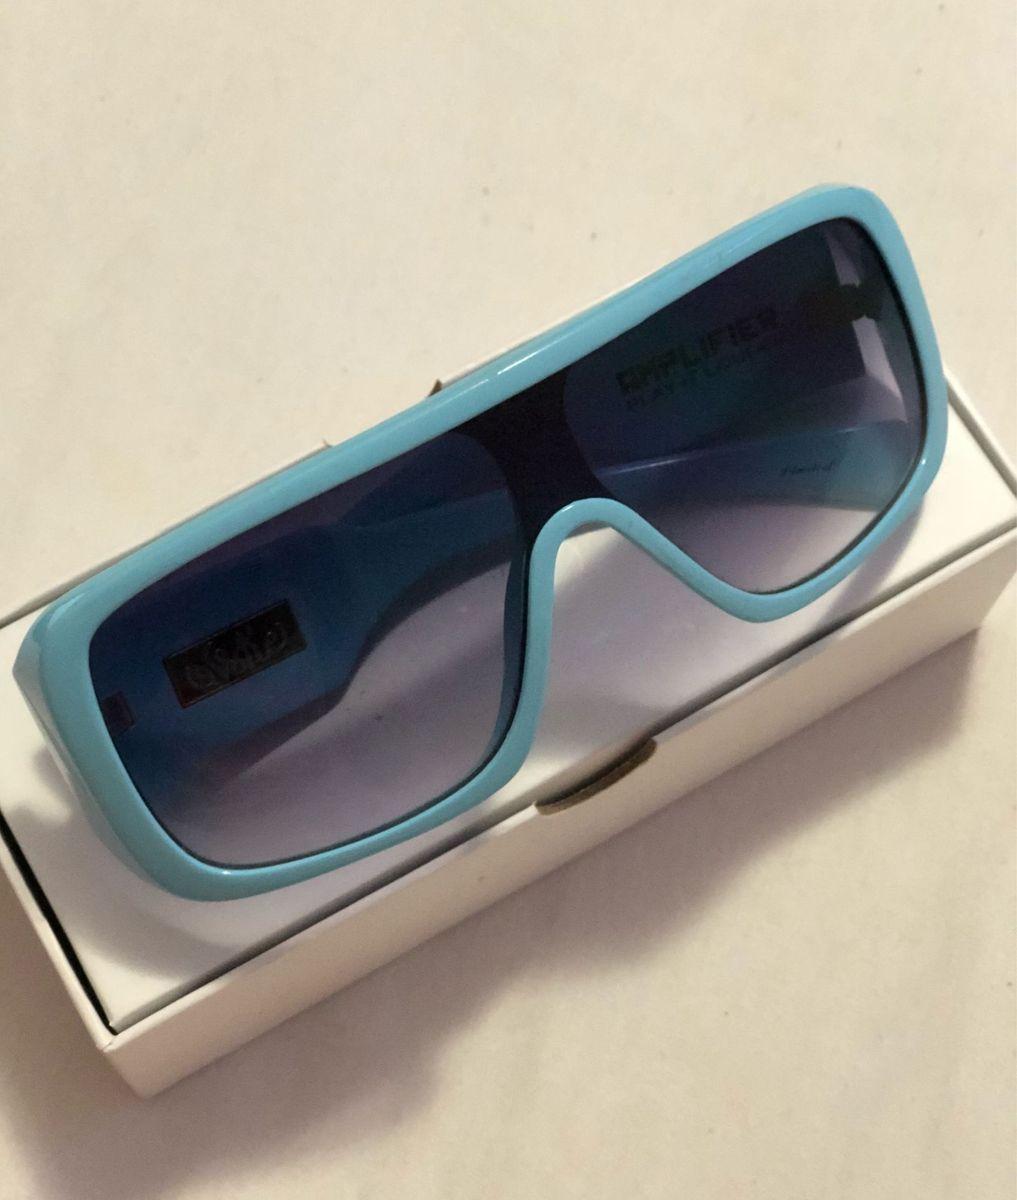 def5c5836dadb óculos de sol evoke - óculos evoke.  Czm6ly9wag90b3muzw5qb2vplmnvbs5ici9wcm9kdwn0cy8xmdi1ndazl2fkzmi3zjq4nmvjmtg1zja0mdqwoty5oty5njnlzjbllmpwzw  ...